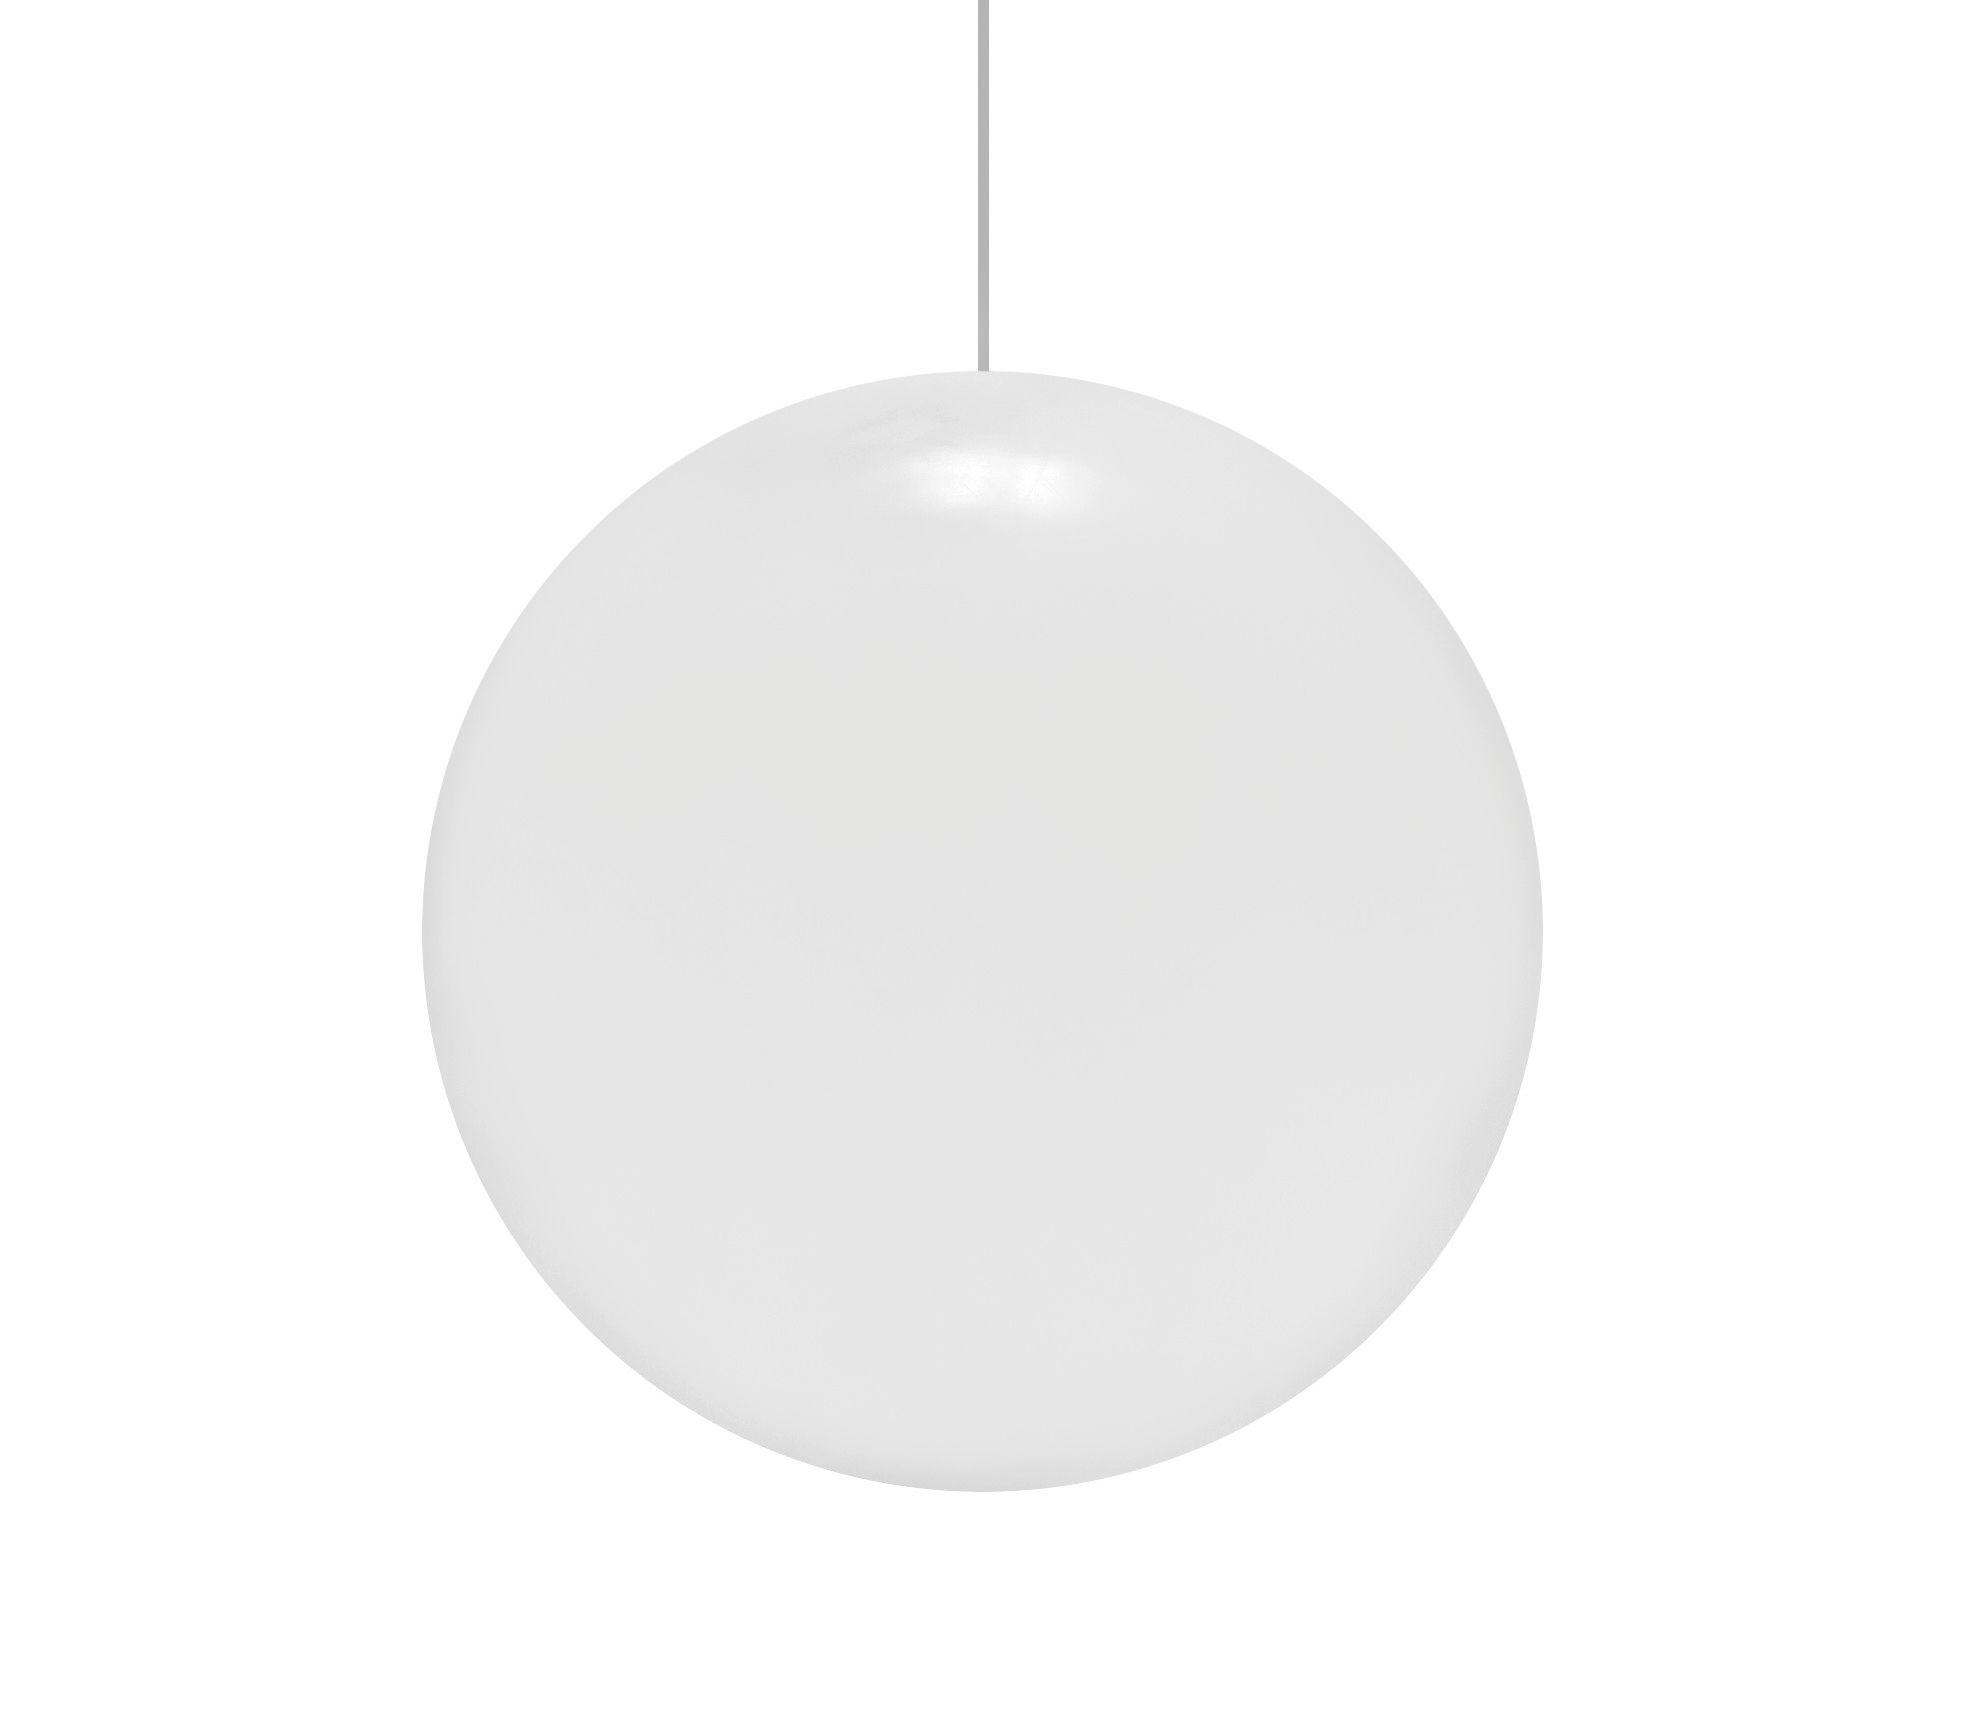 Illuminazione - Lampadari - Sospensione Globo di Slide - Bianco - Ø 30 cm - Polietilene